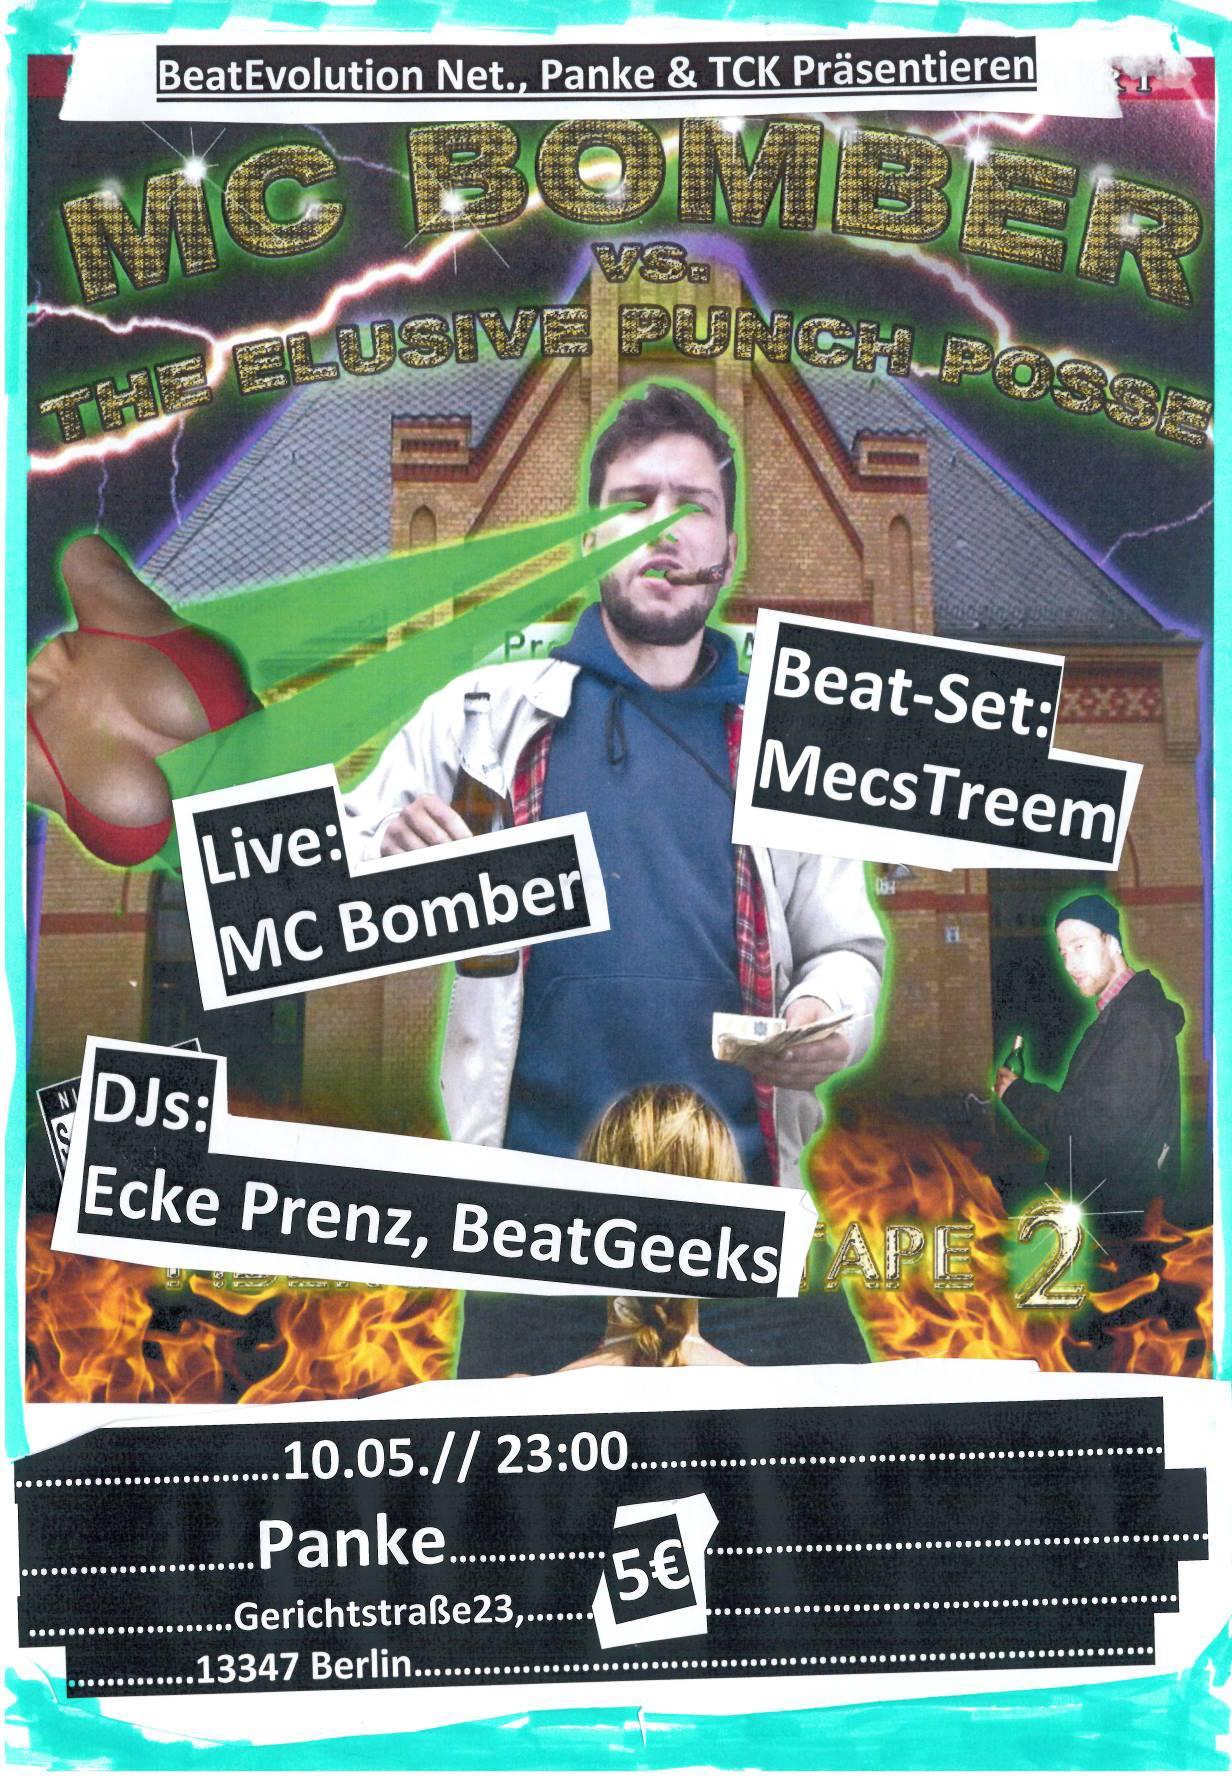 The Prenzlbergaz feat. MC Bomber